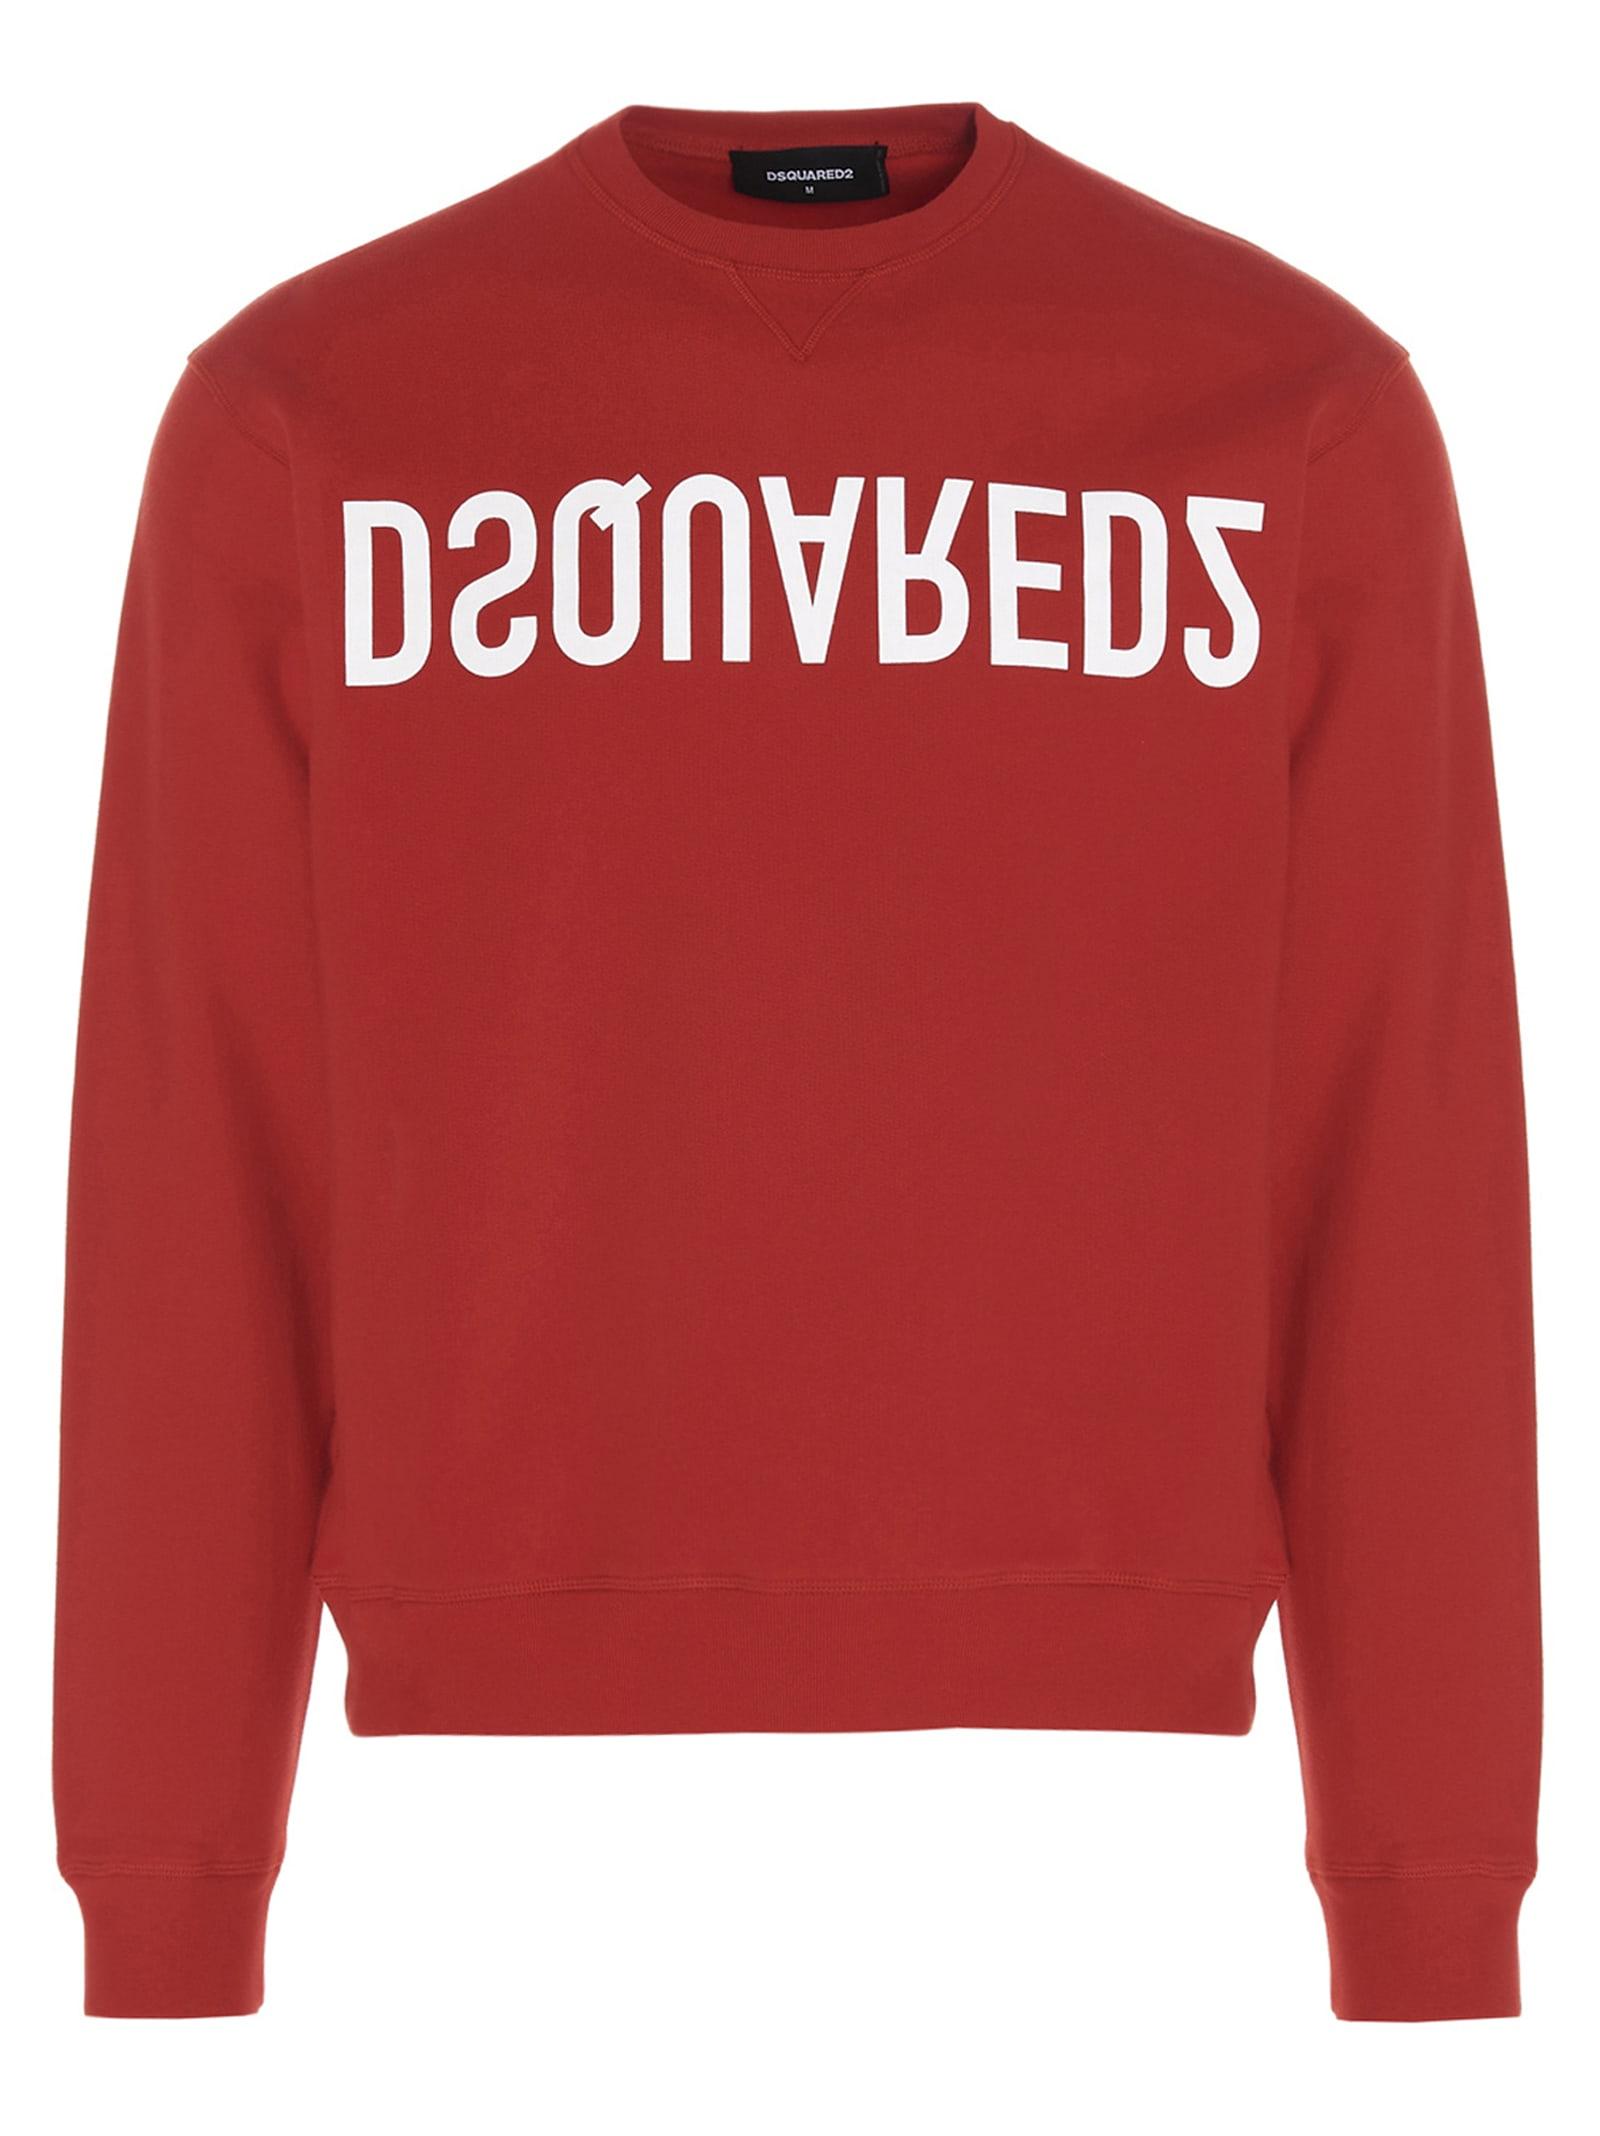 Dsquared2 logo Reverse Dsq2 Sweater